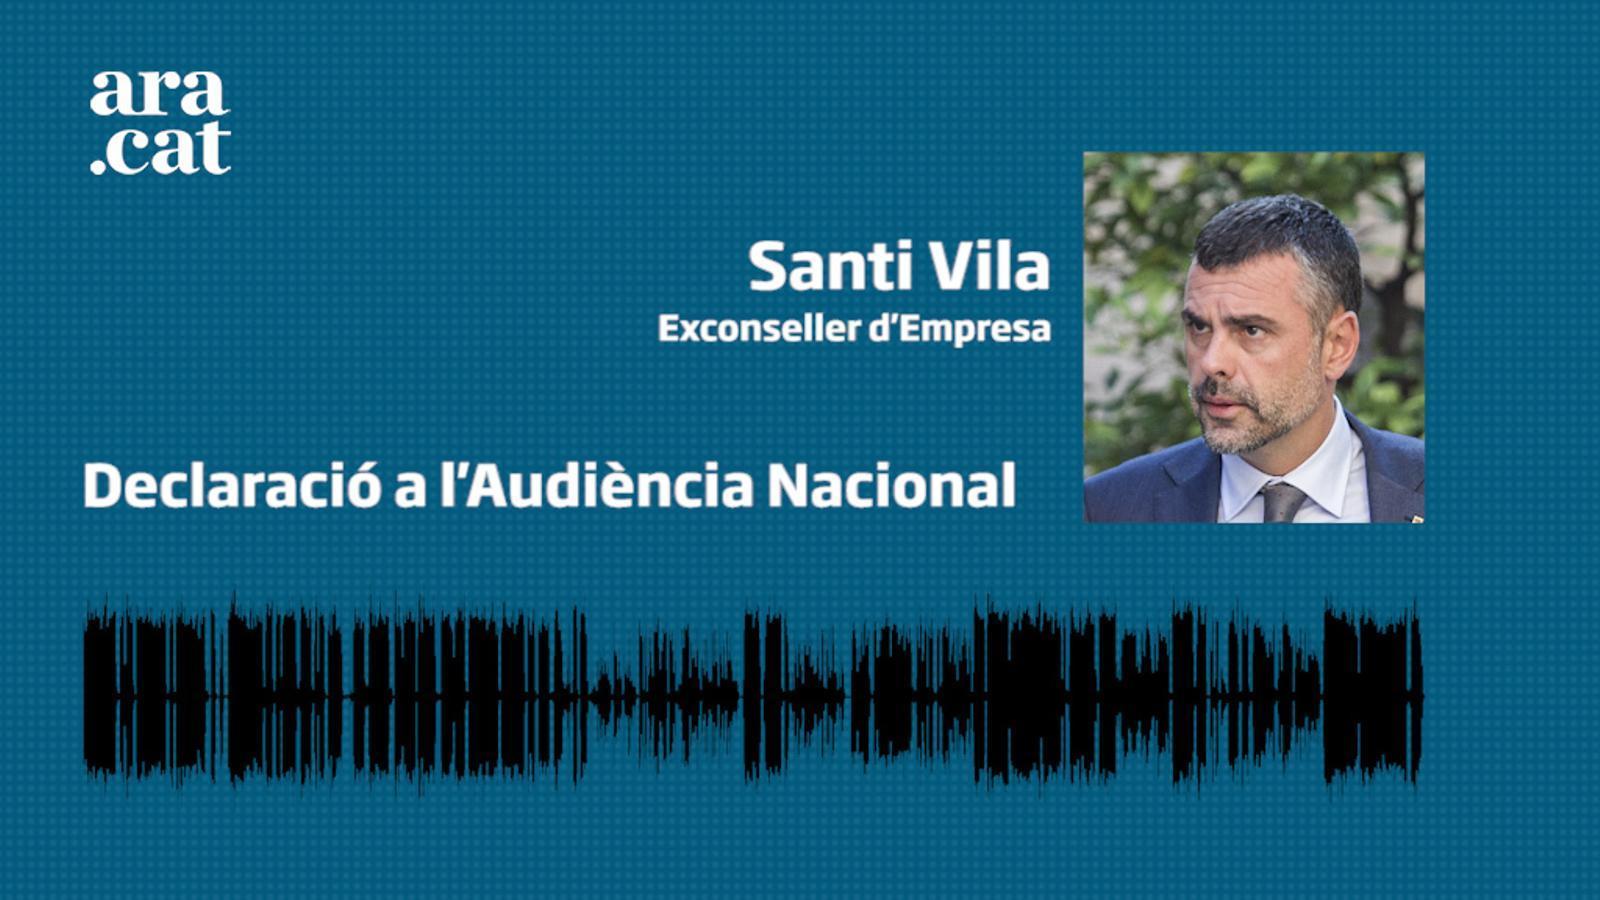 Santi Vila declara a l'Audiència Nacional - testimoni 3